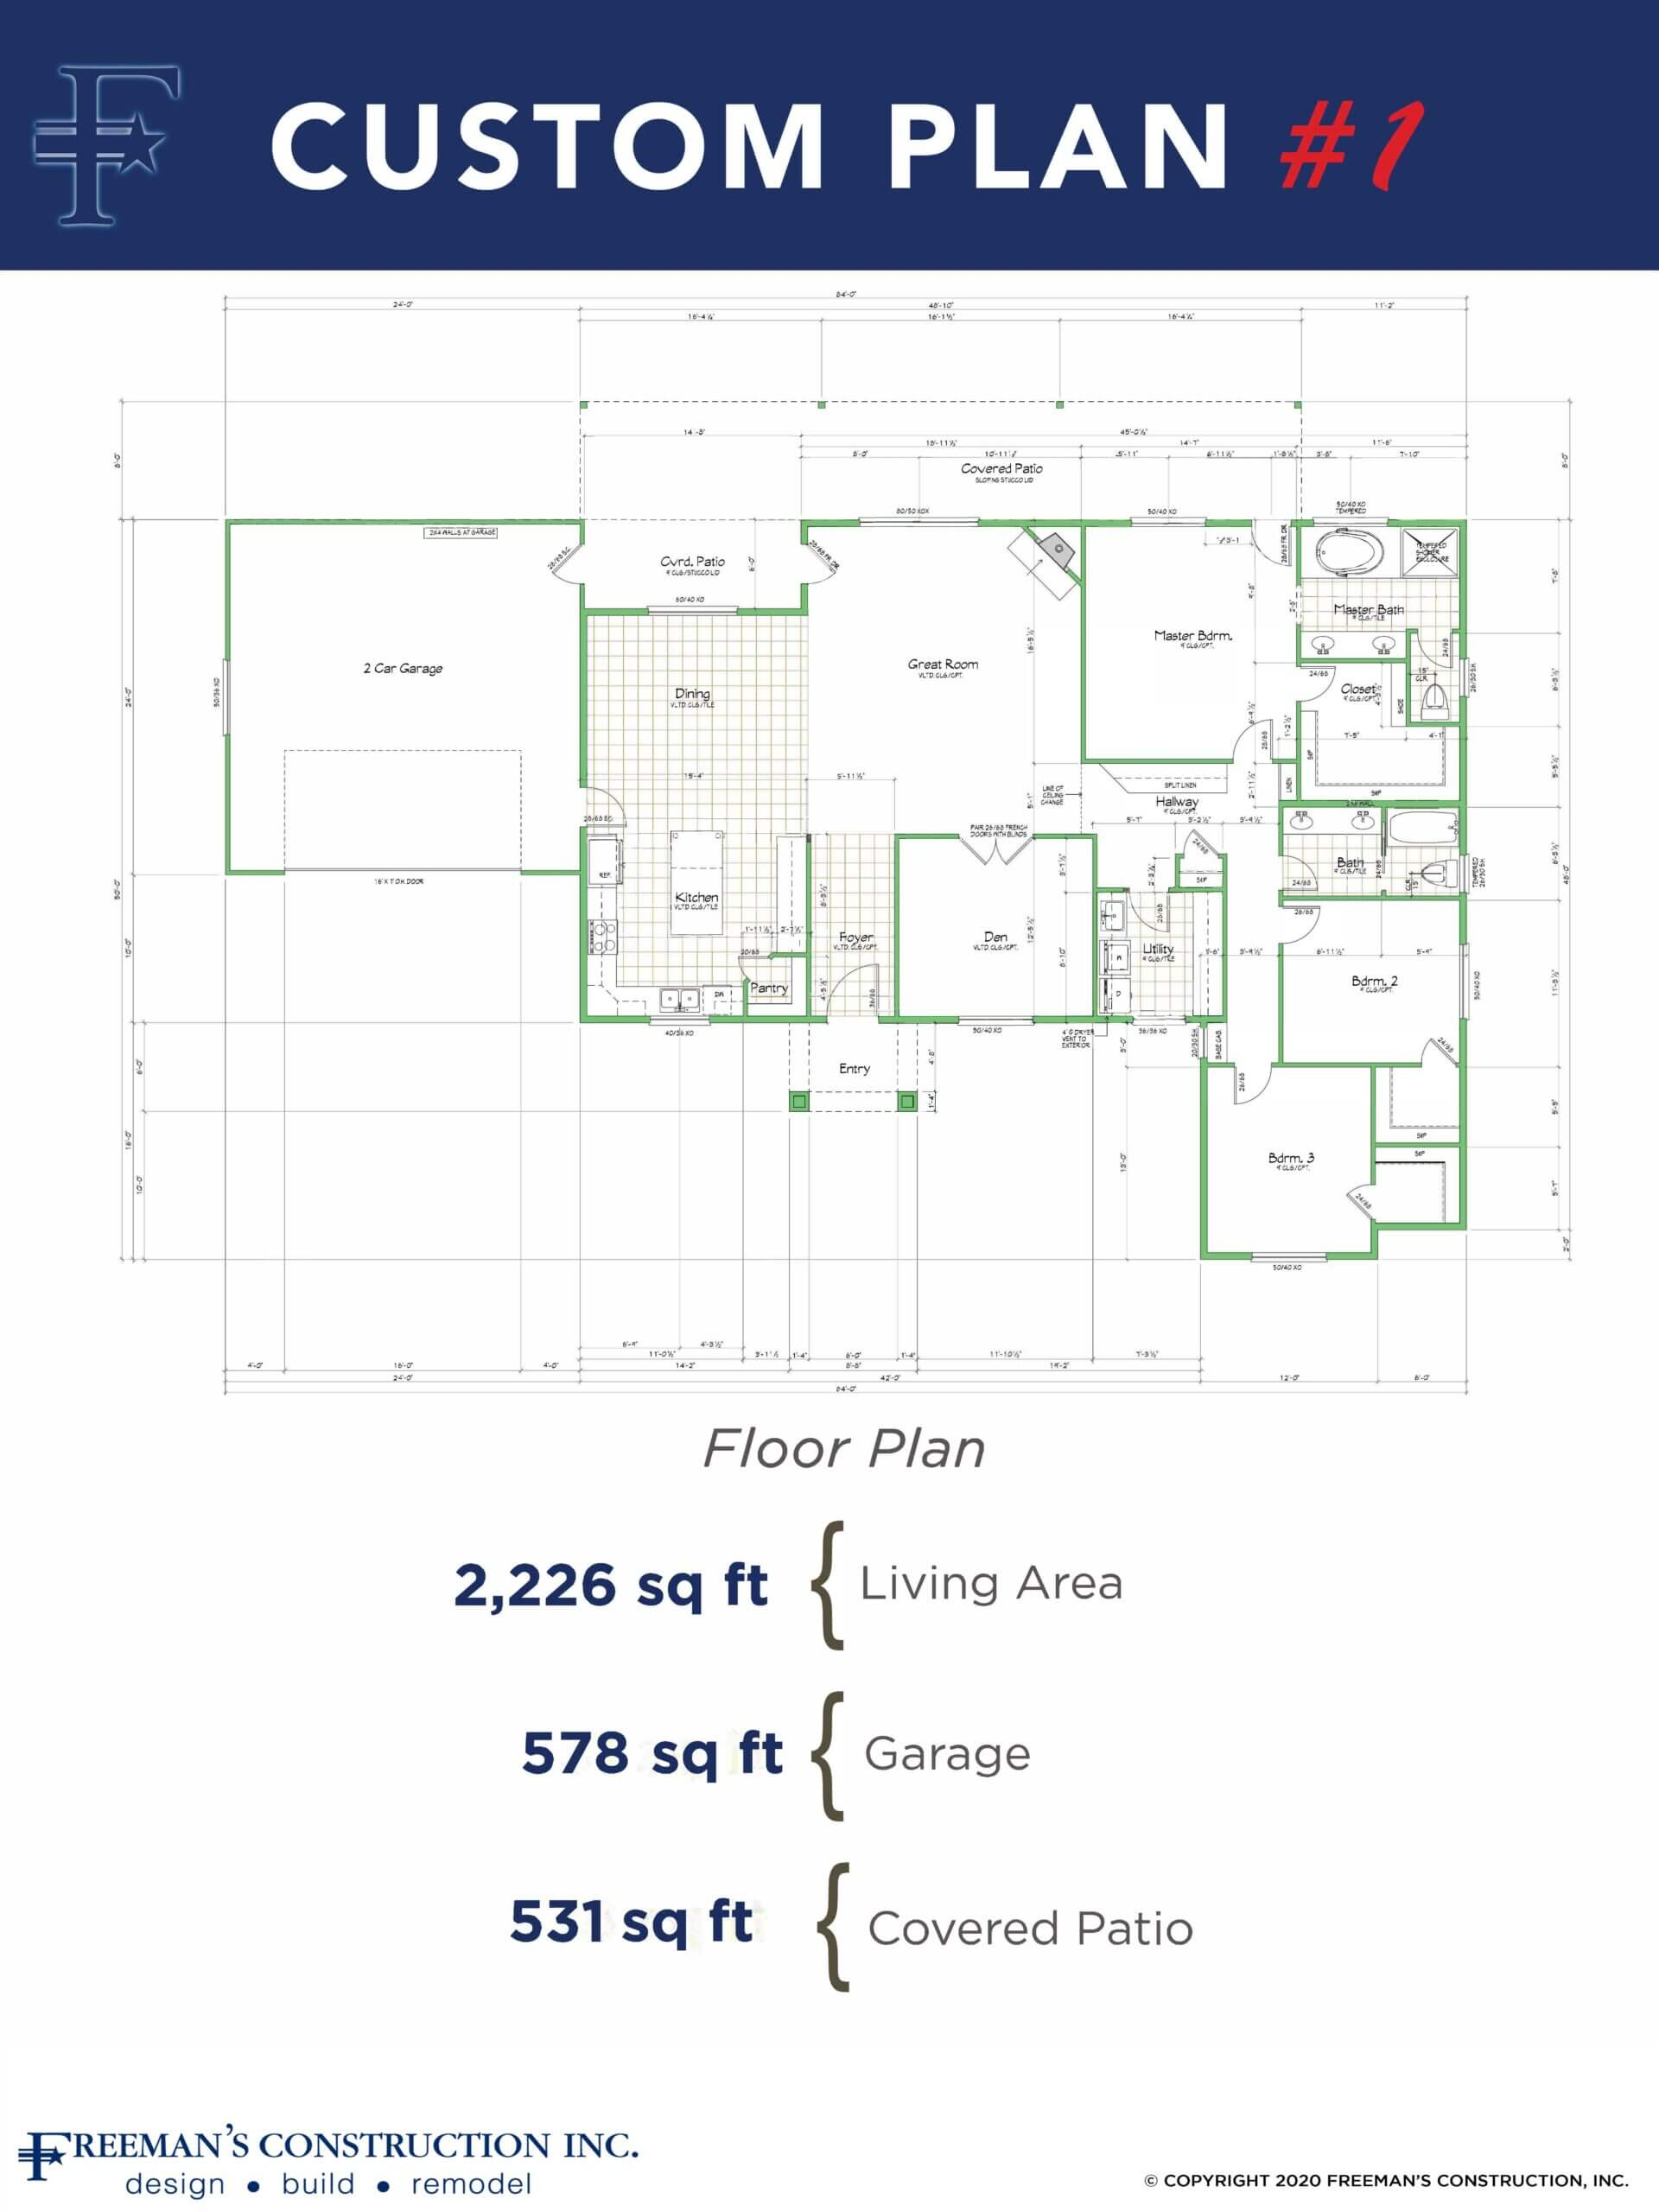 custom-home-floor-plan-1-in-ramona-ca-by-freemans-construction-inc